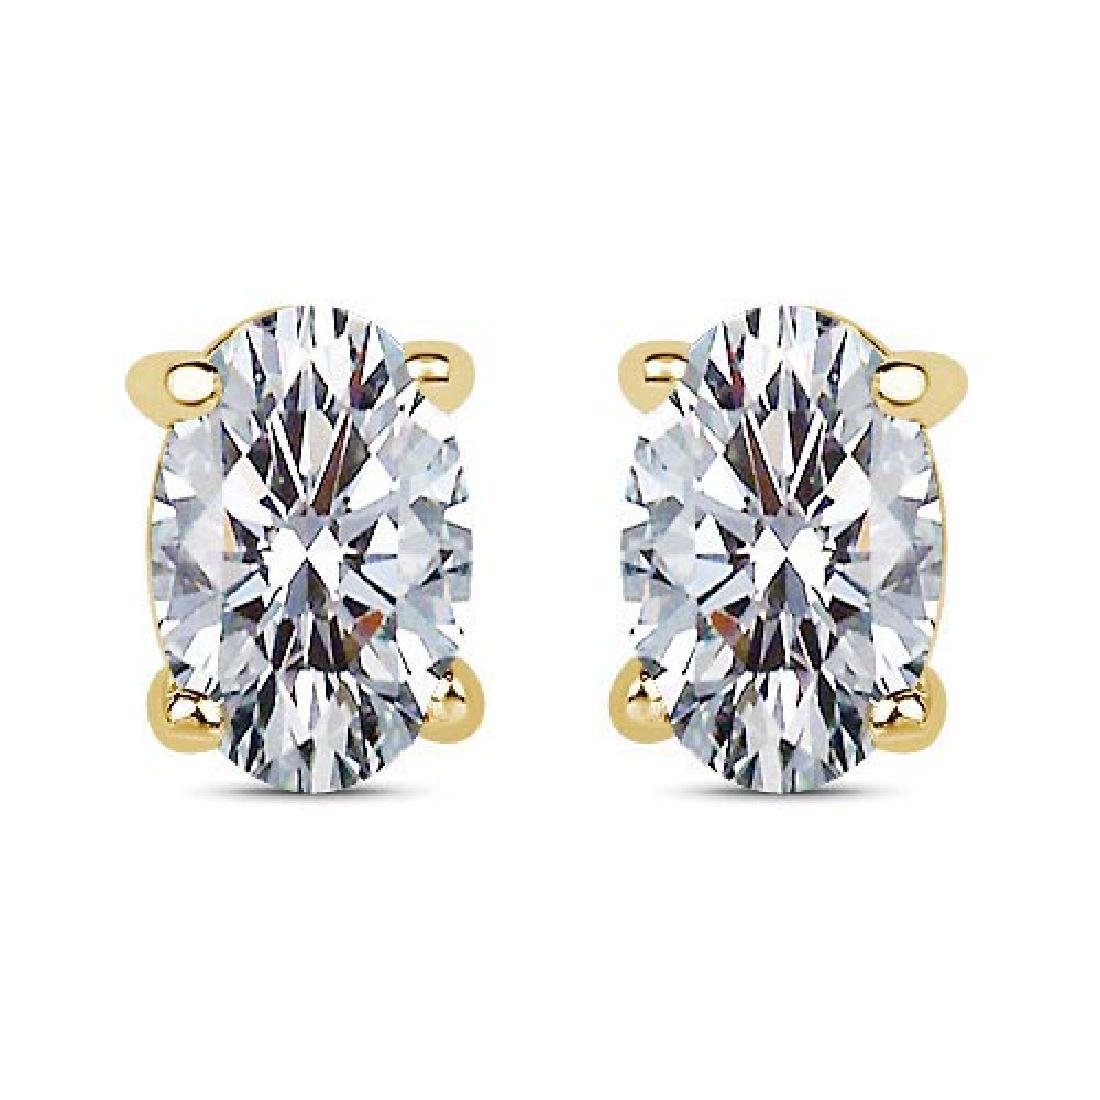 Certified 1.00 CTW Oval Diamond 14K Yellow Gold Earring